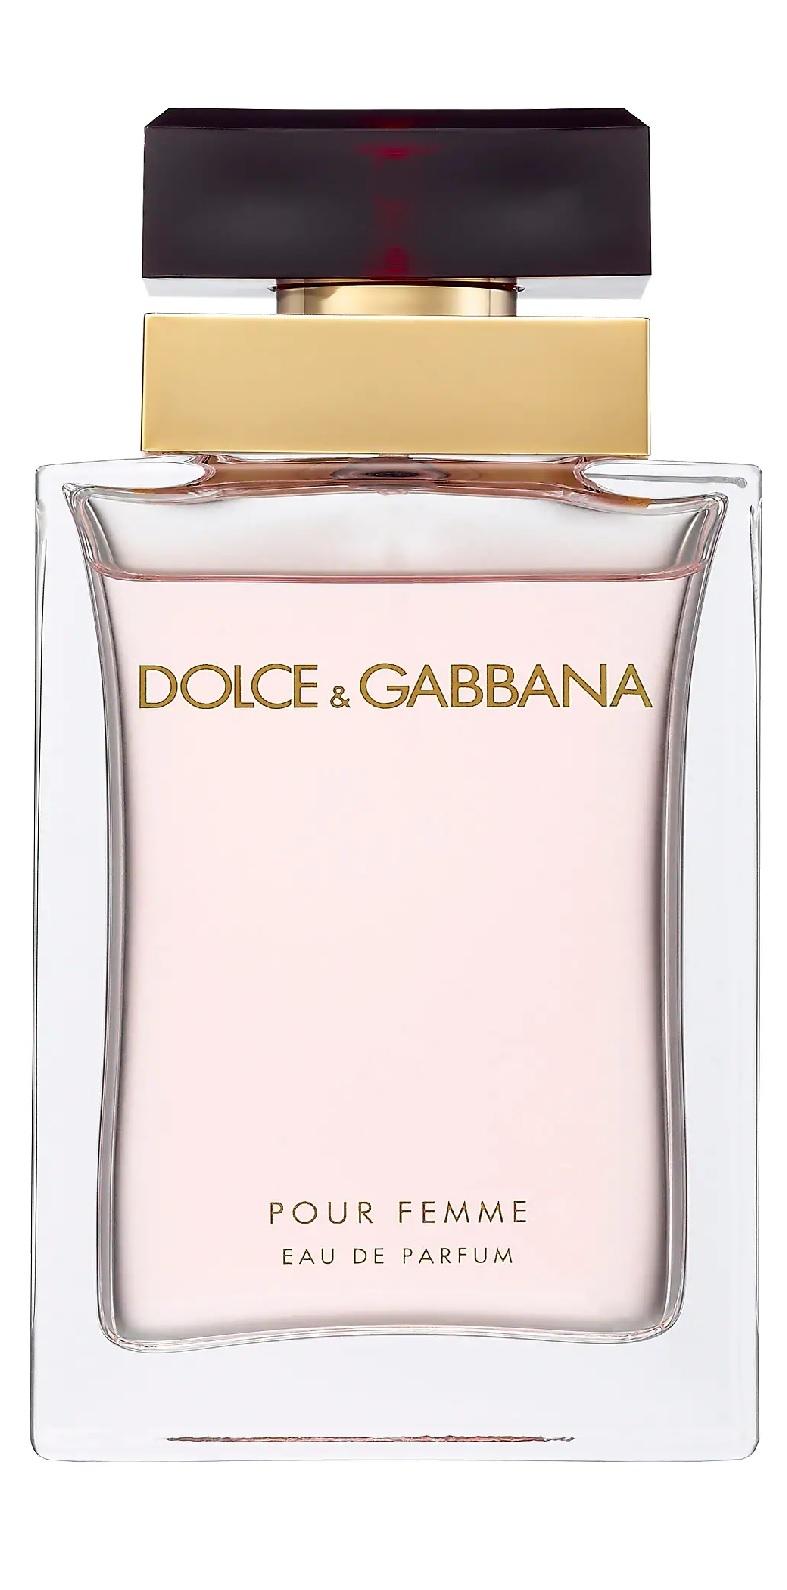 Dolce & Gabbana Pour Femme (W) edp 100ml